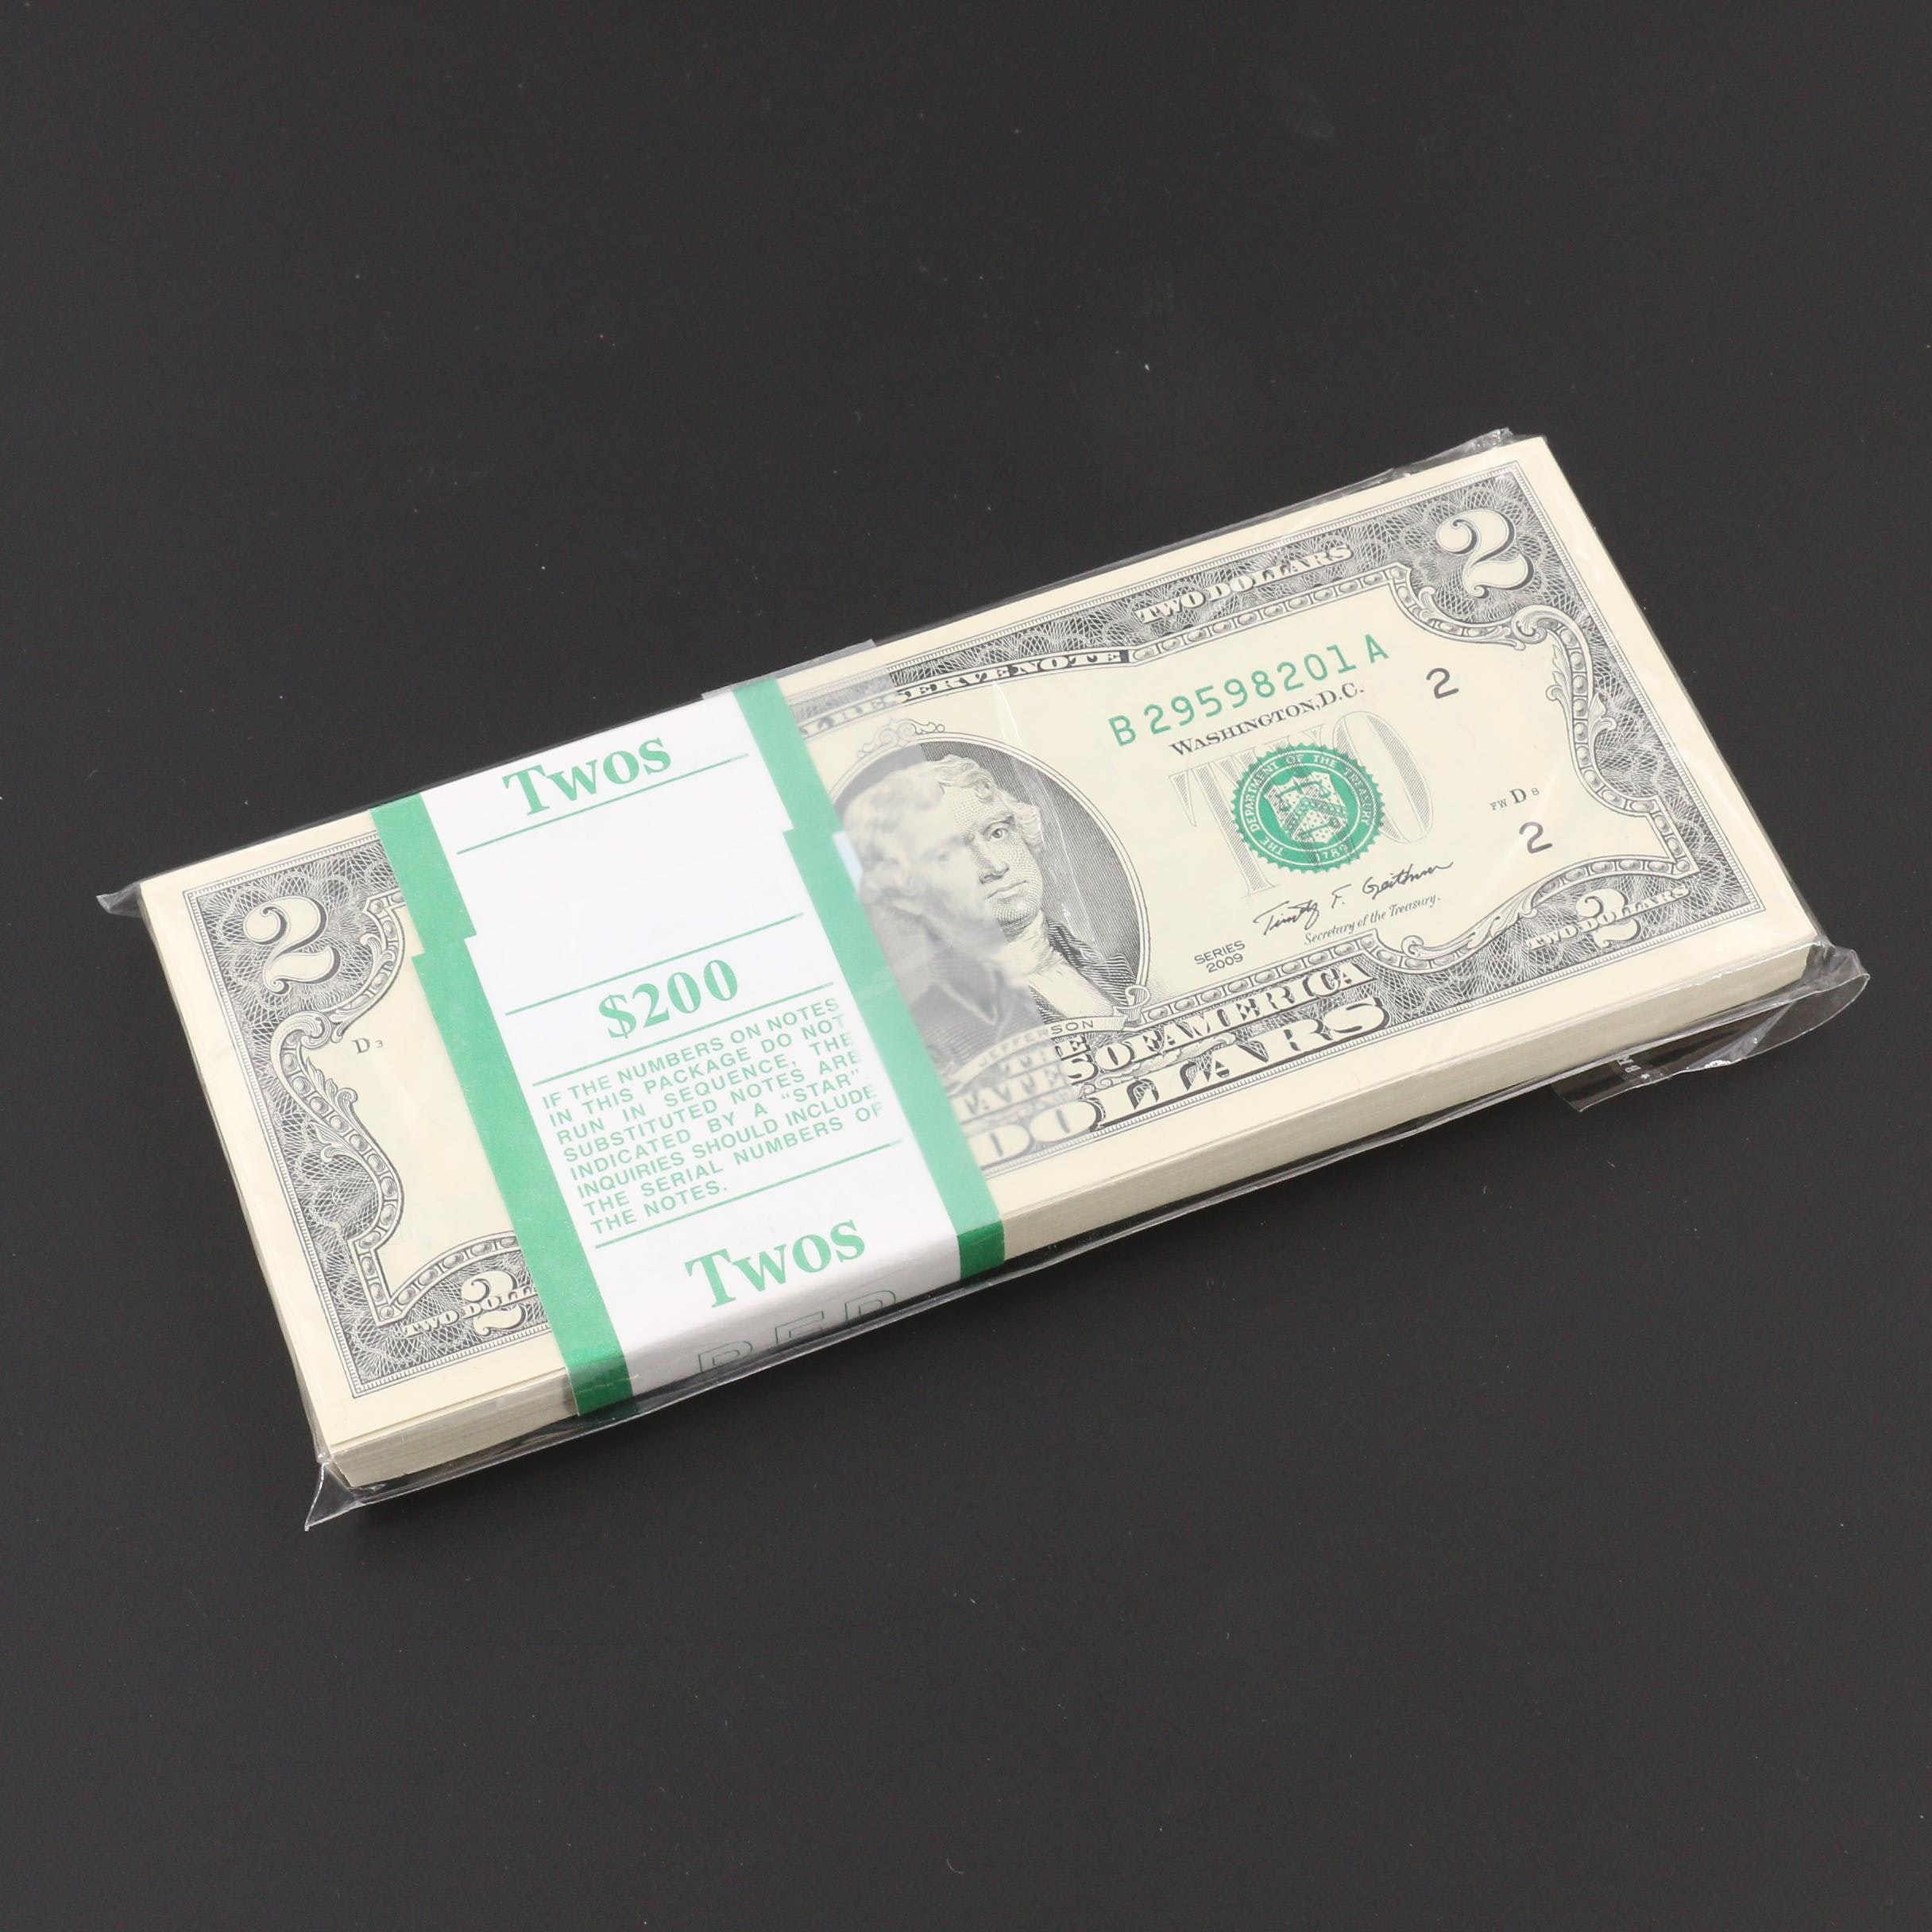 Uncirculated Brick of 100 Consecutive Serial Numbered 2009 U.S. $2 Notes